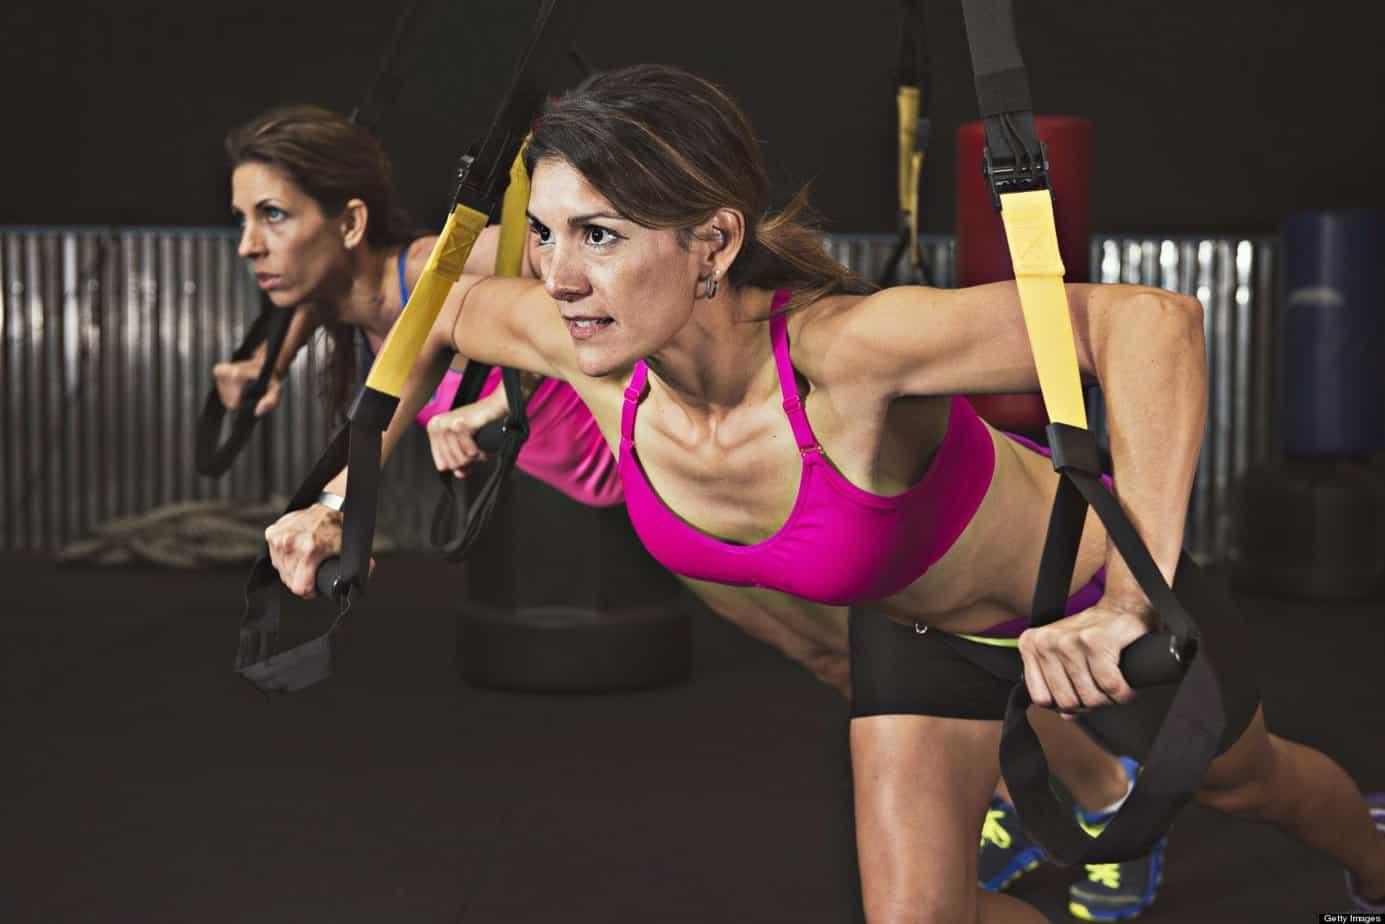 Women performing bodyweight exercises